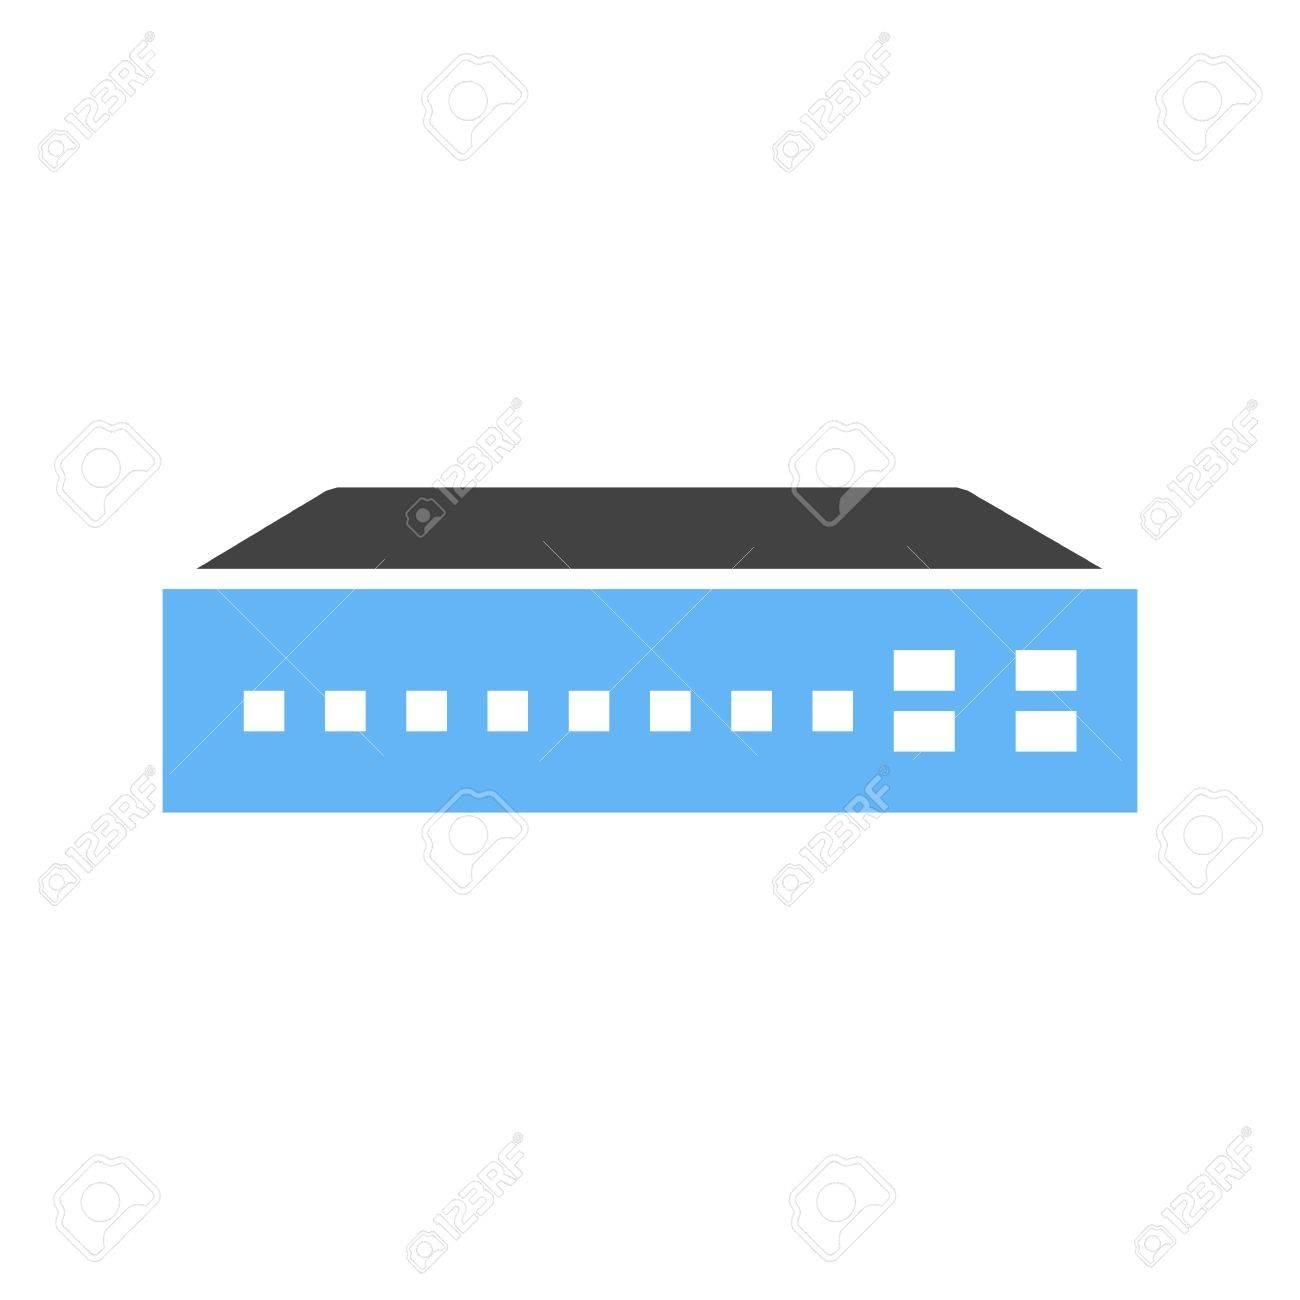 Schalter, Netzwerk, Router-Symbol Bild Vektor-Vernetzung. Kann Auch ...